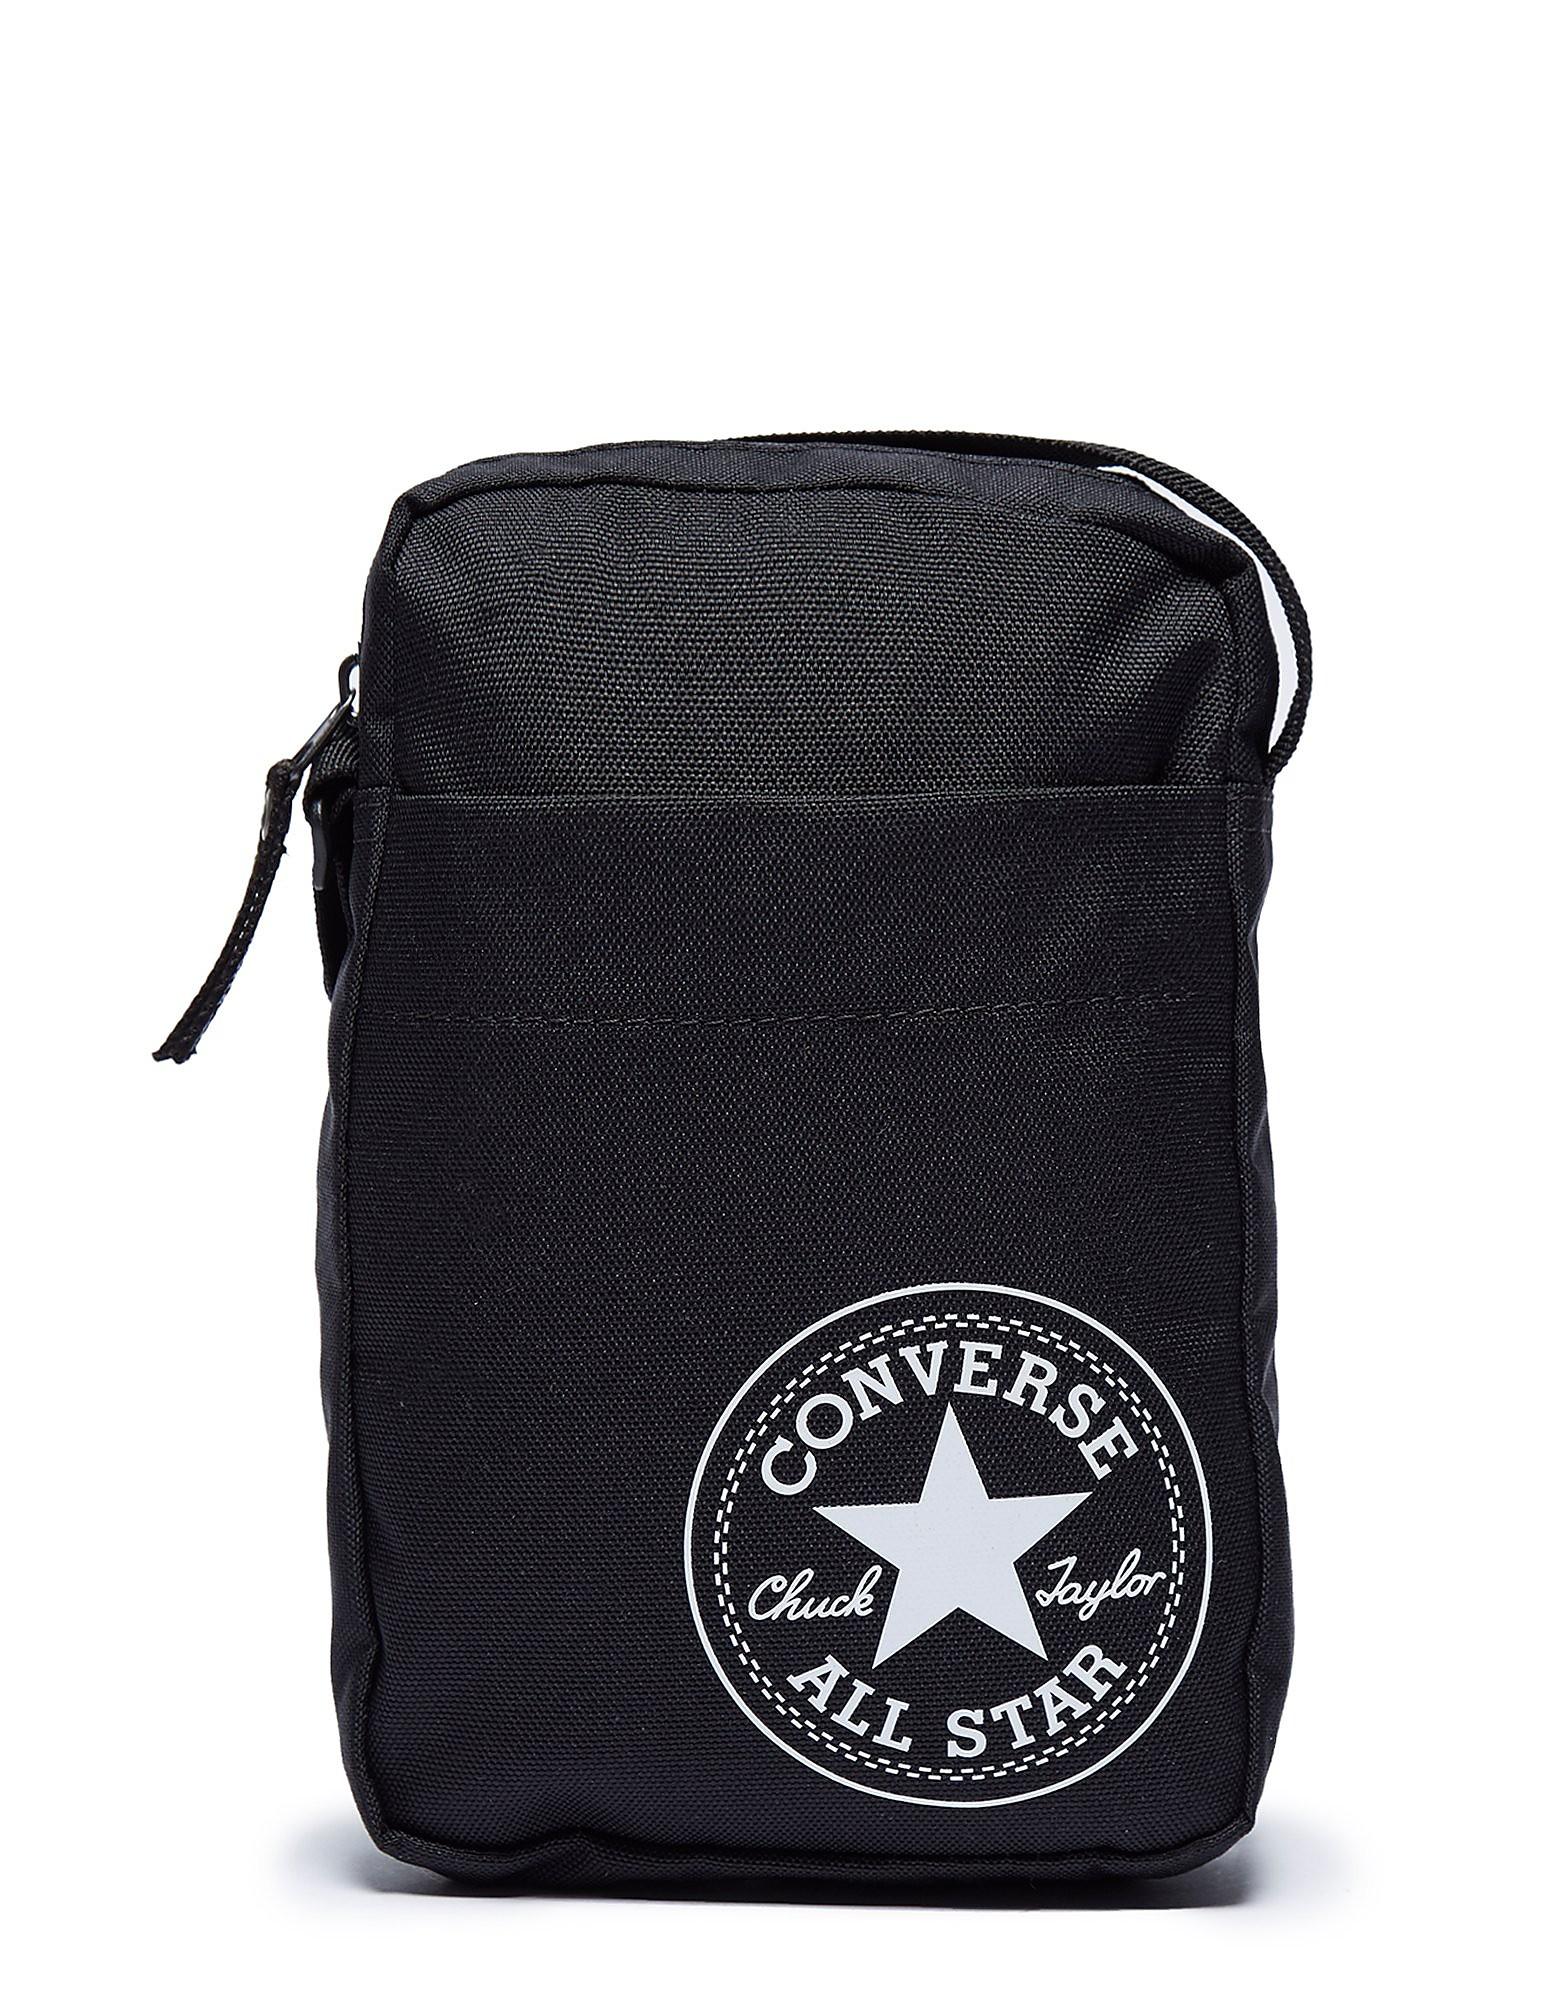 Converse City Bag